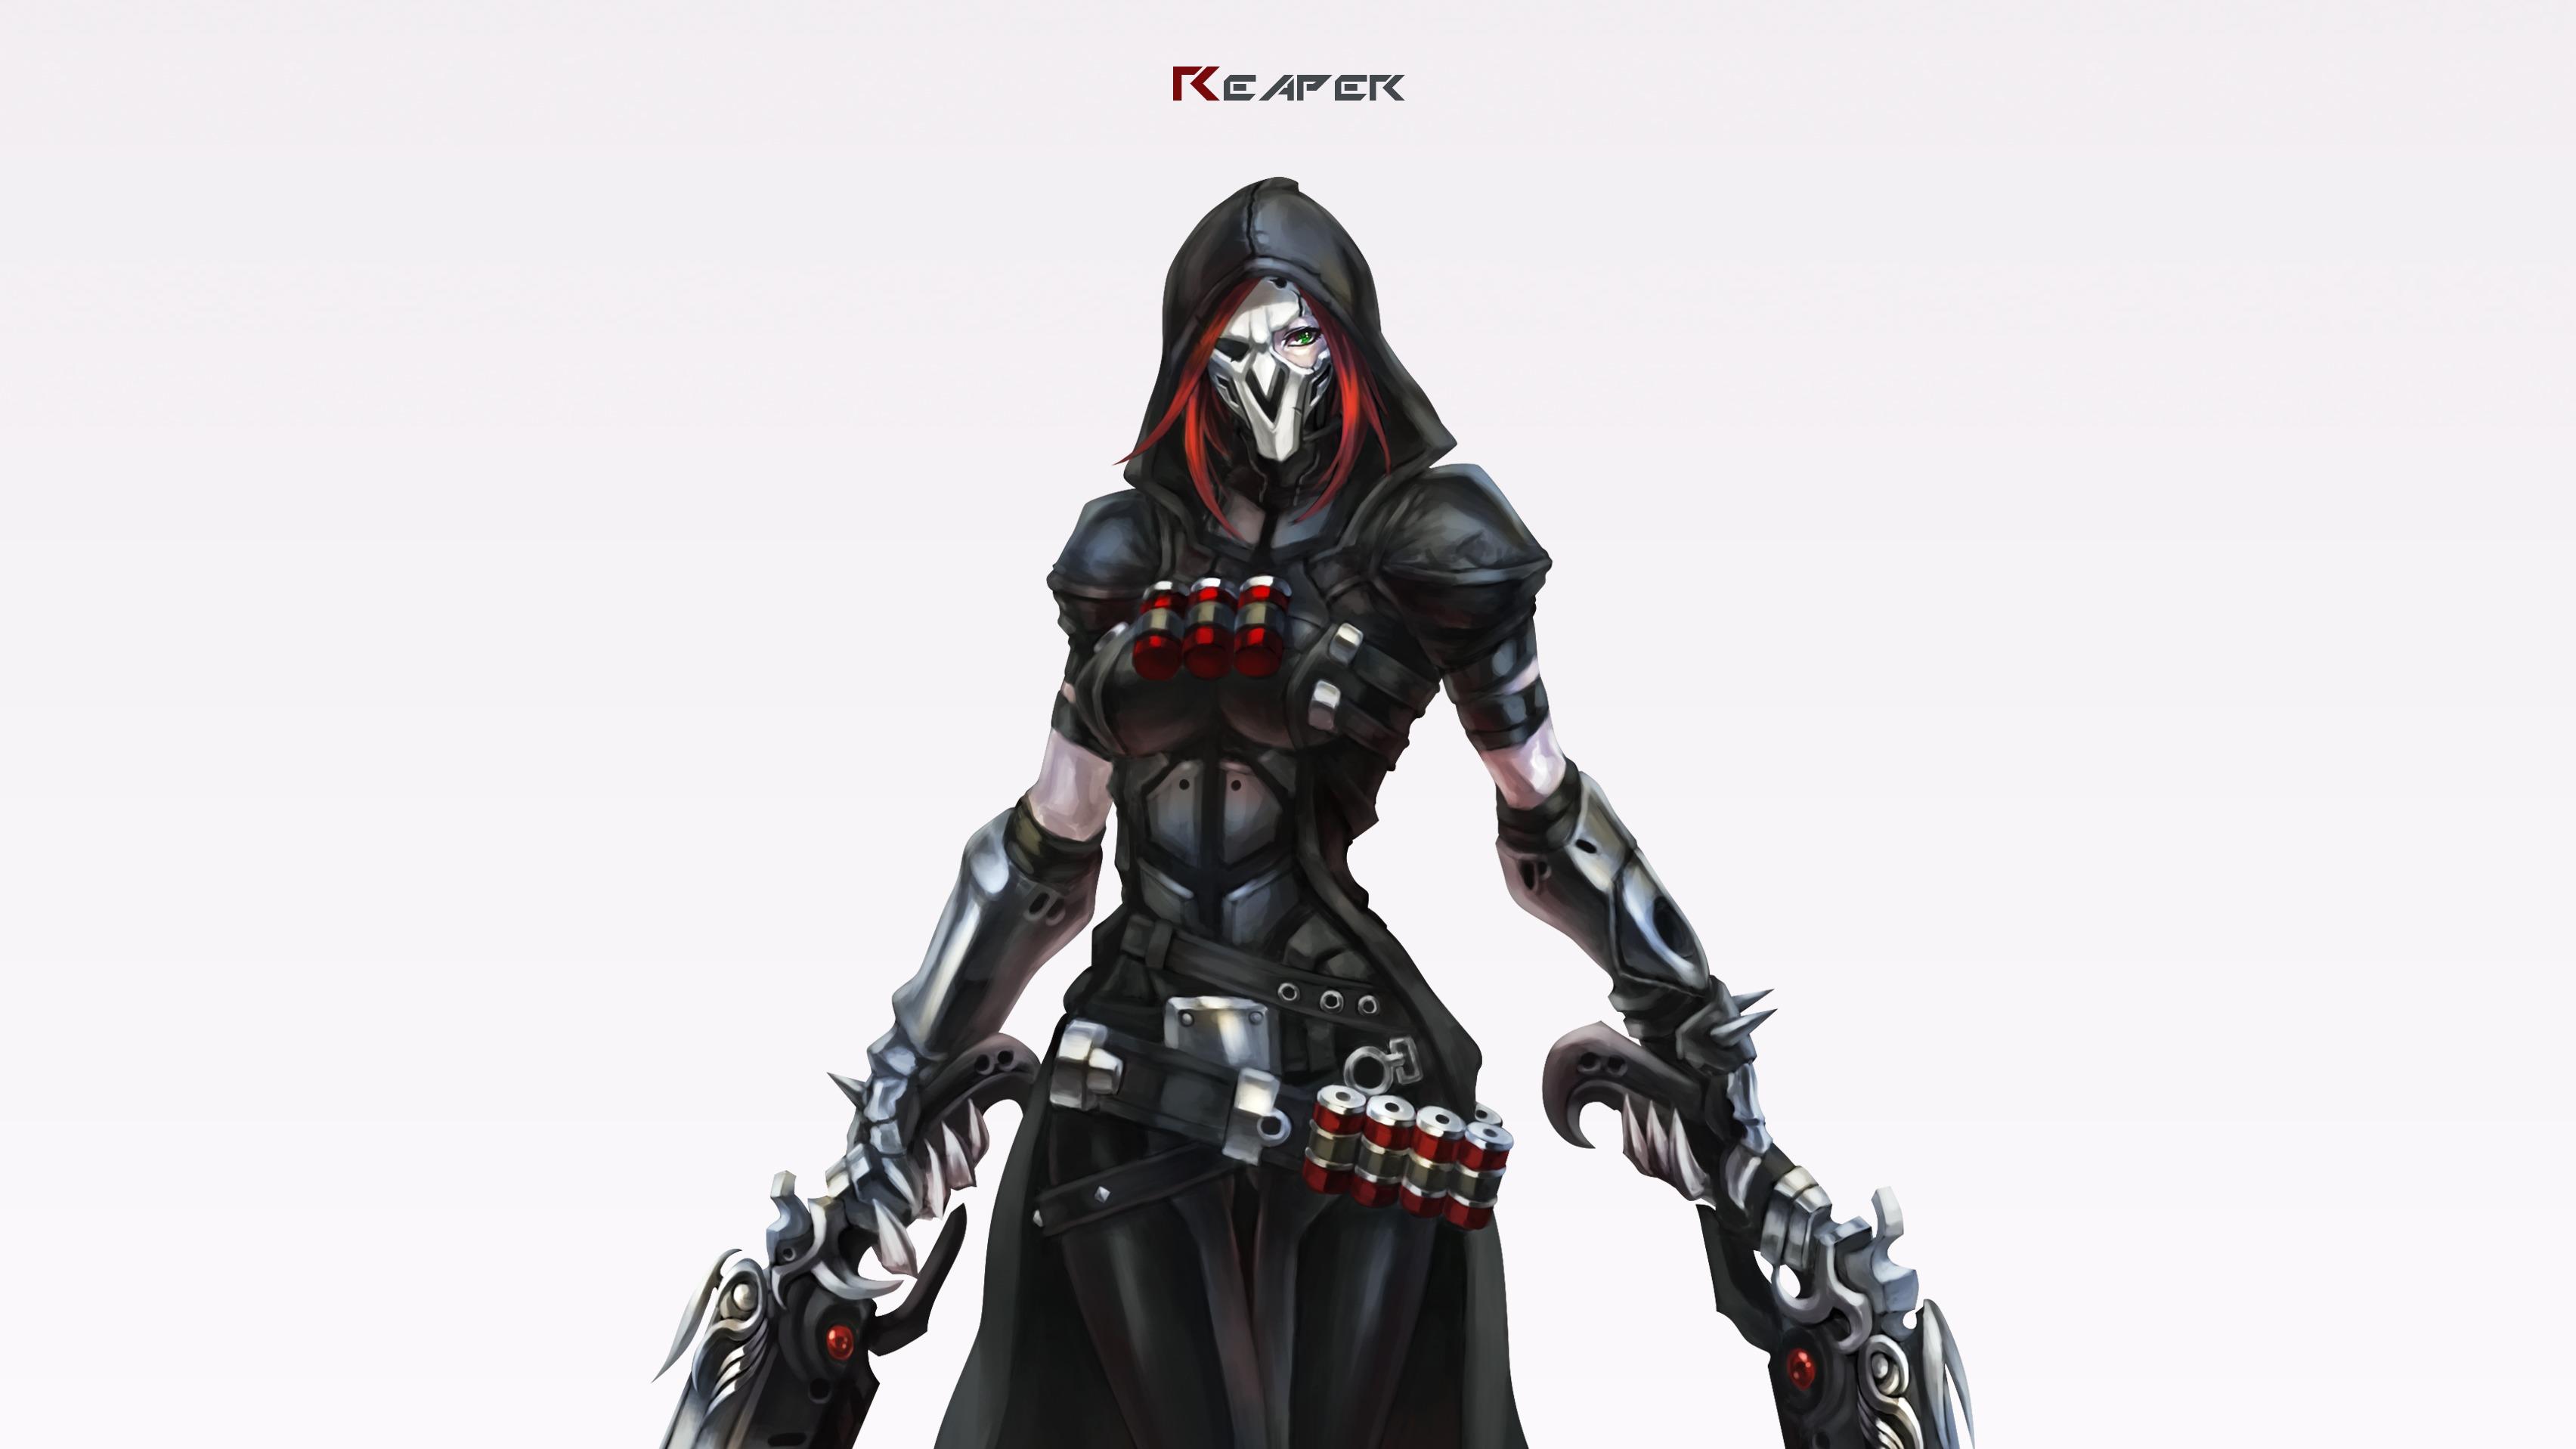 Overwatch: Gun, Mask, Reaper, Red Hair